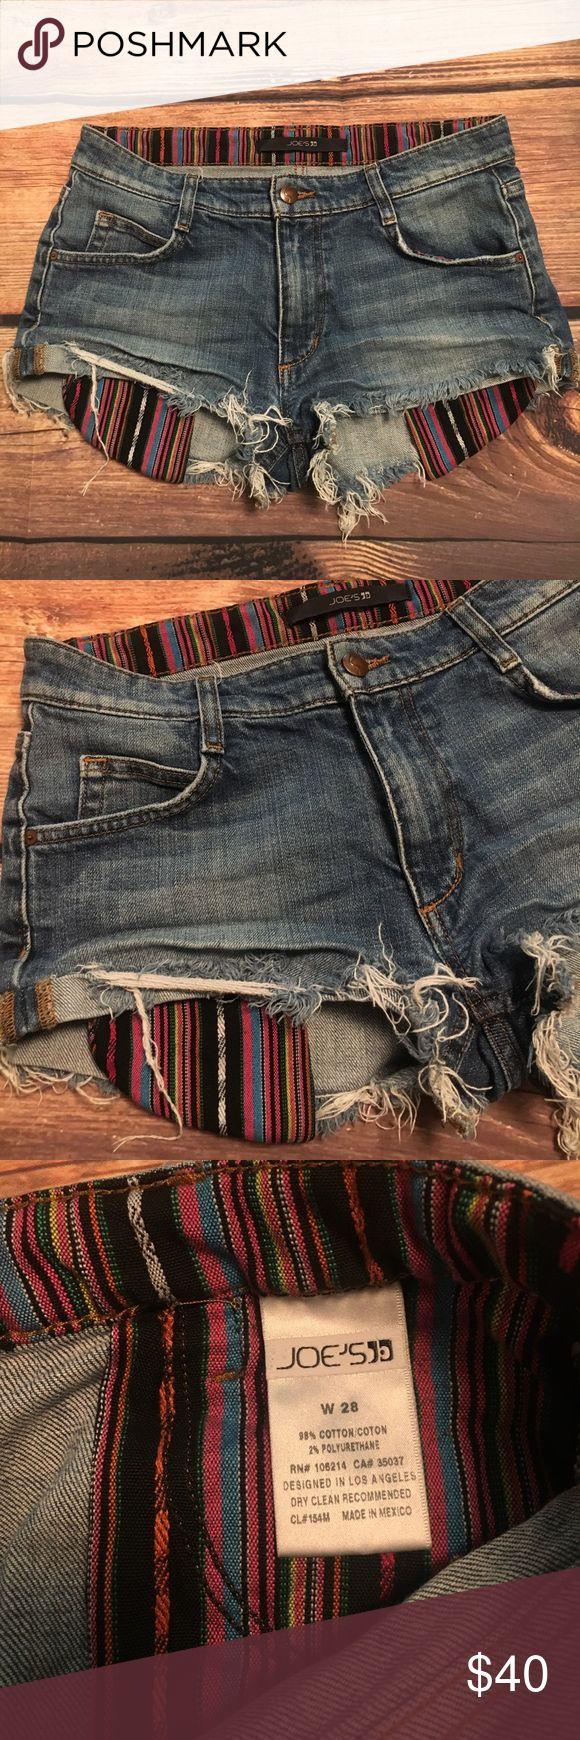 "Joes jeans cut off daisy duke shorts high waist 28 High waist distressed daisy duke shorts with boho pocket designs. Size 28 waist measures 15.5"" across Joe's Jeans Shorts Jean Shorts"